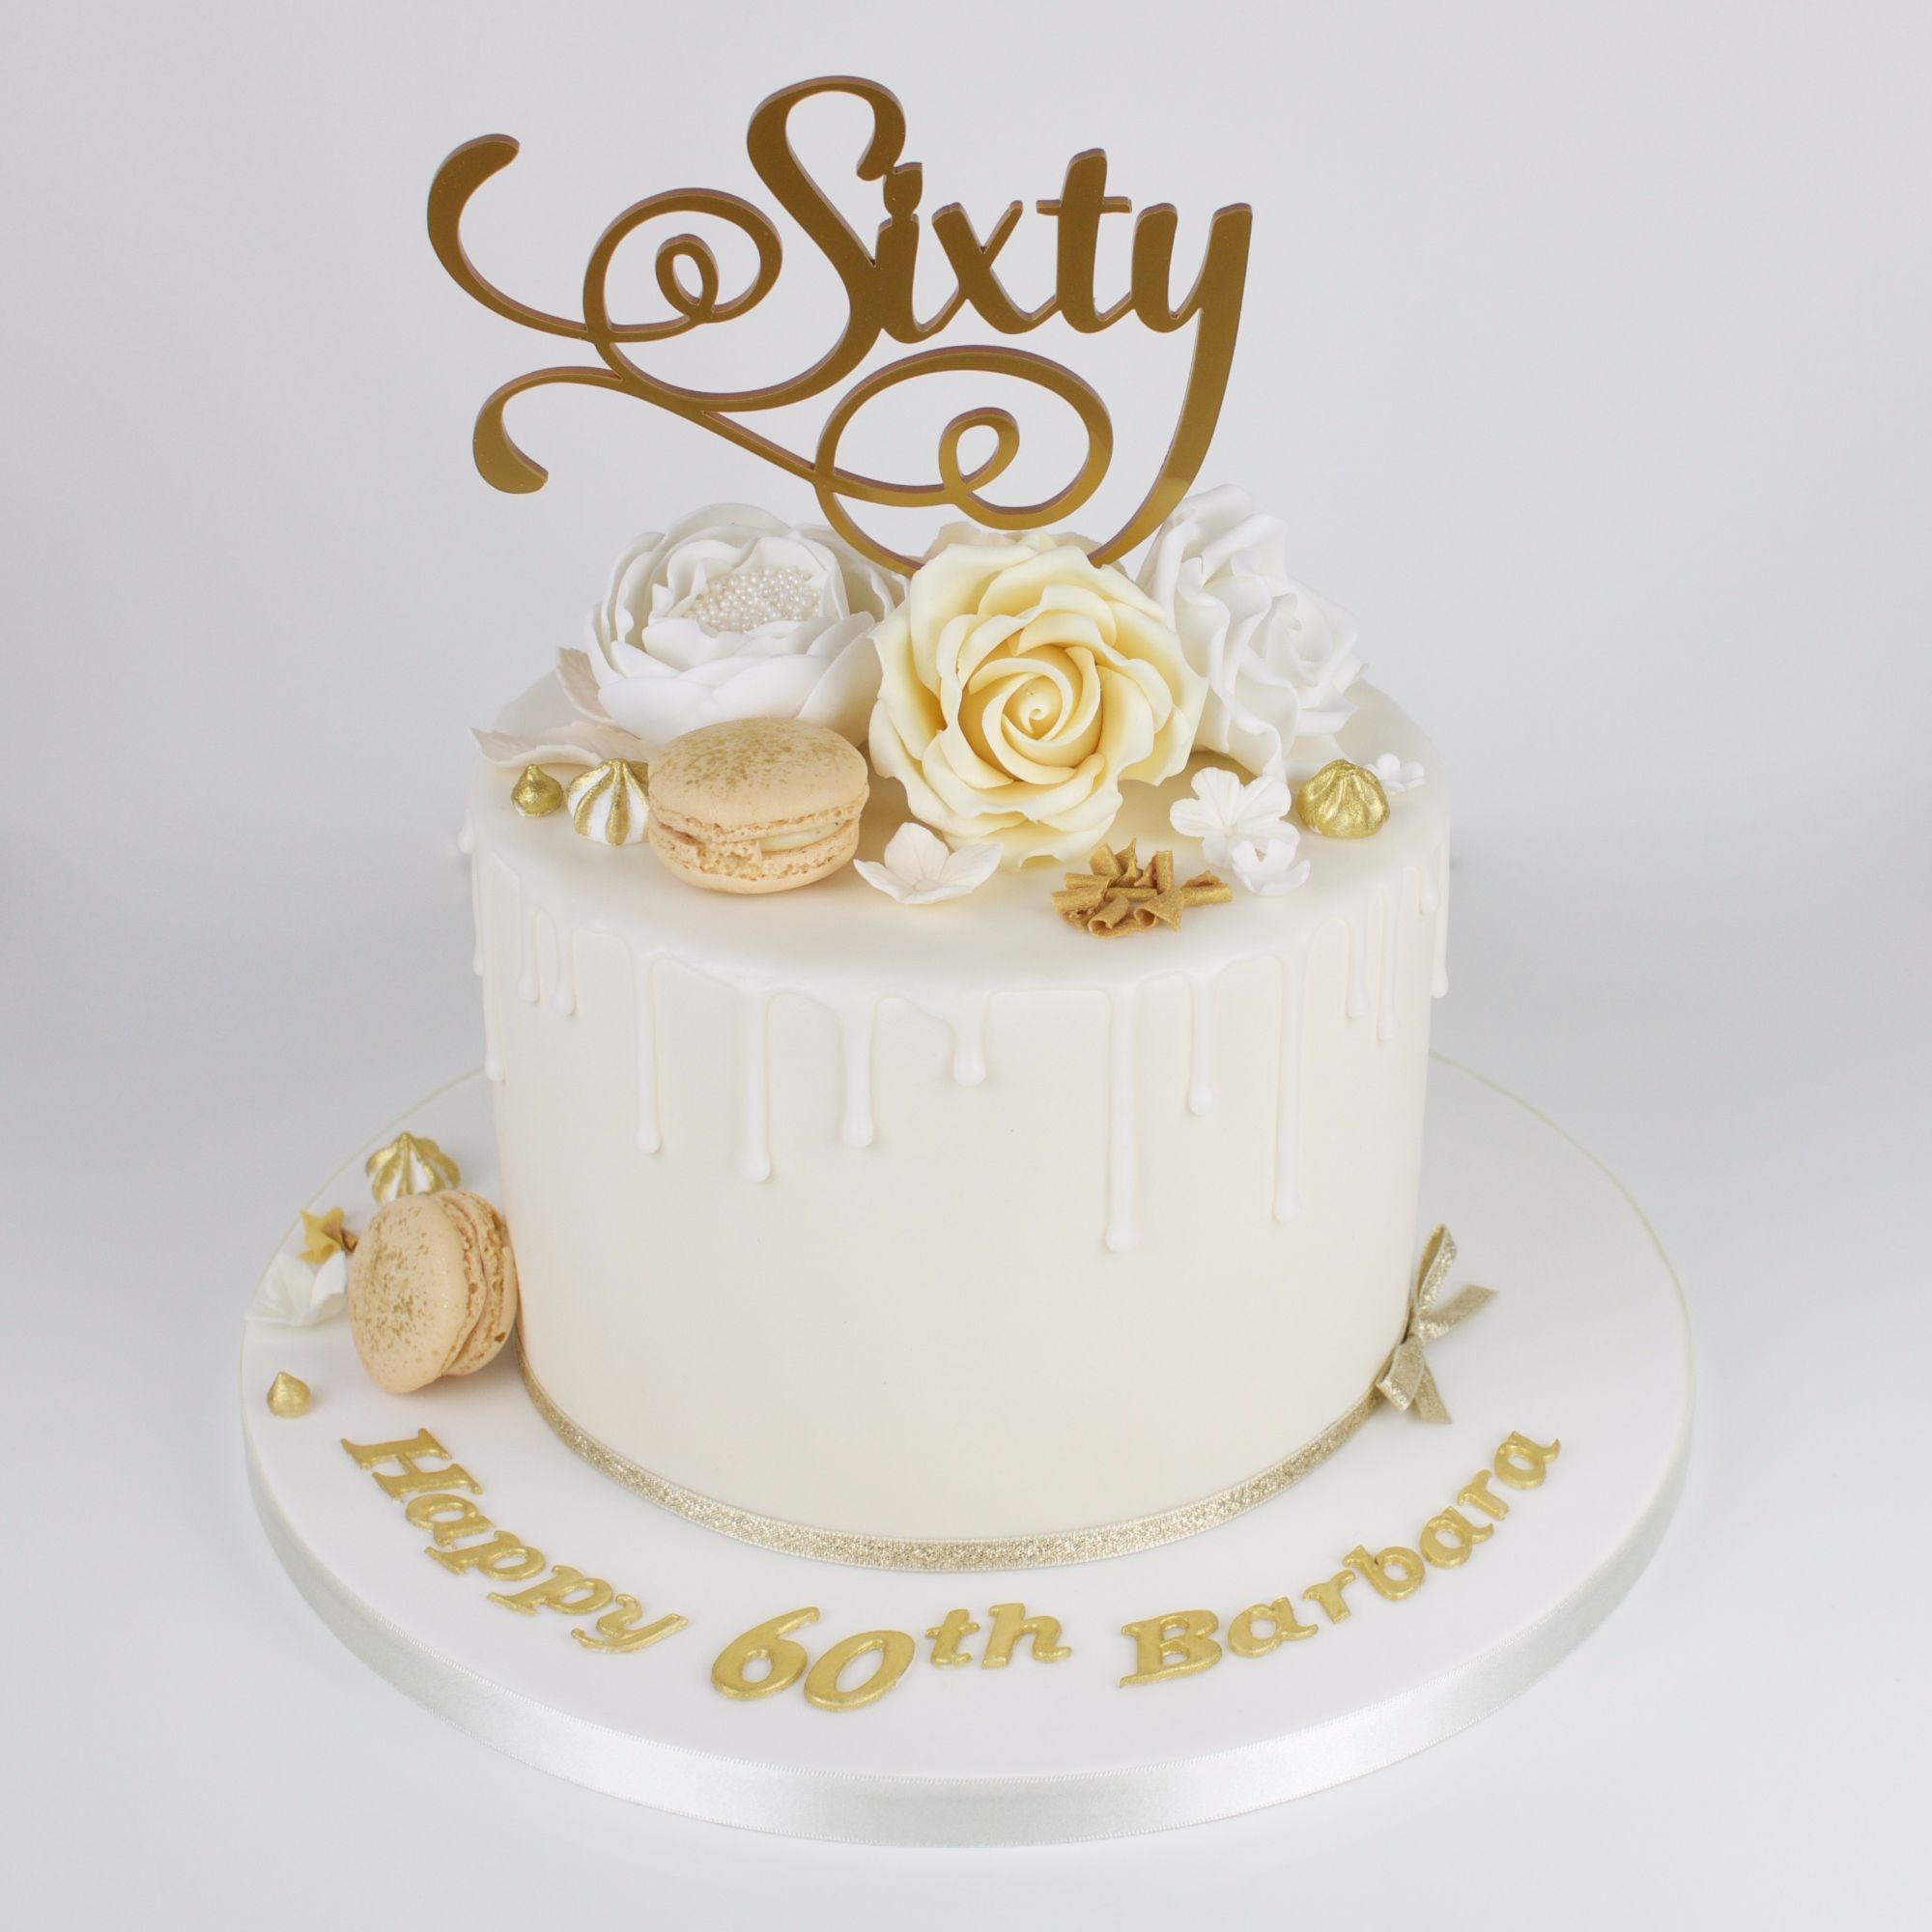 7 Mom S Cake Ideas Cake 50th Birthday Cake Birthday Cakes For Women